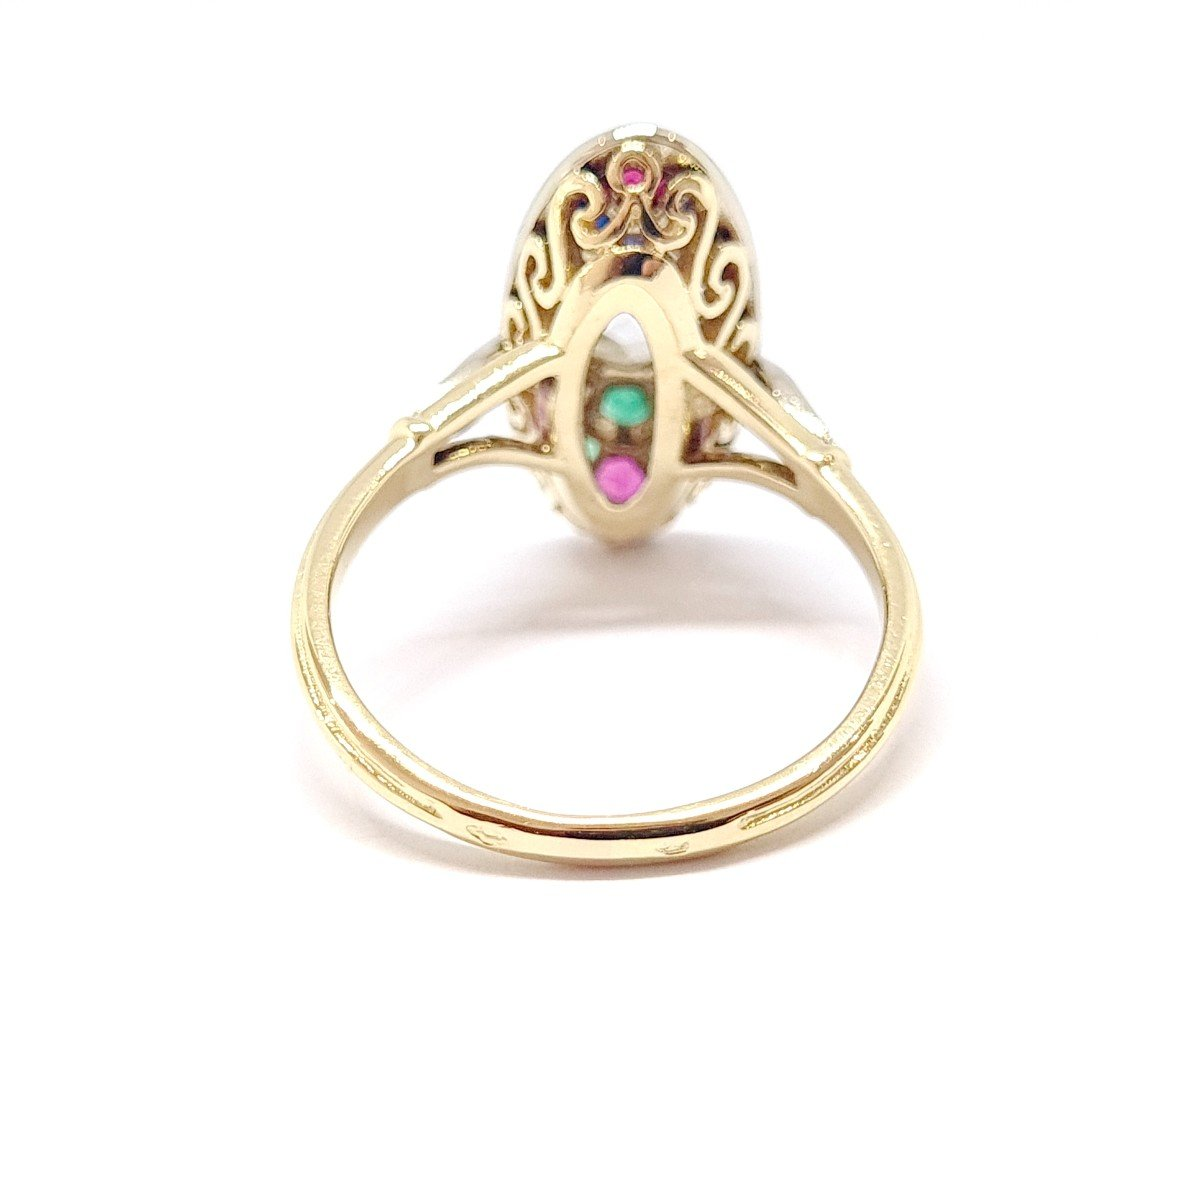 Bague Ancienne Or Jaune 18 Carats Diamants Saphirs Rubis émeraudes-photo-3